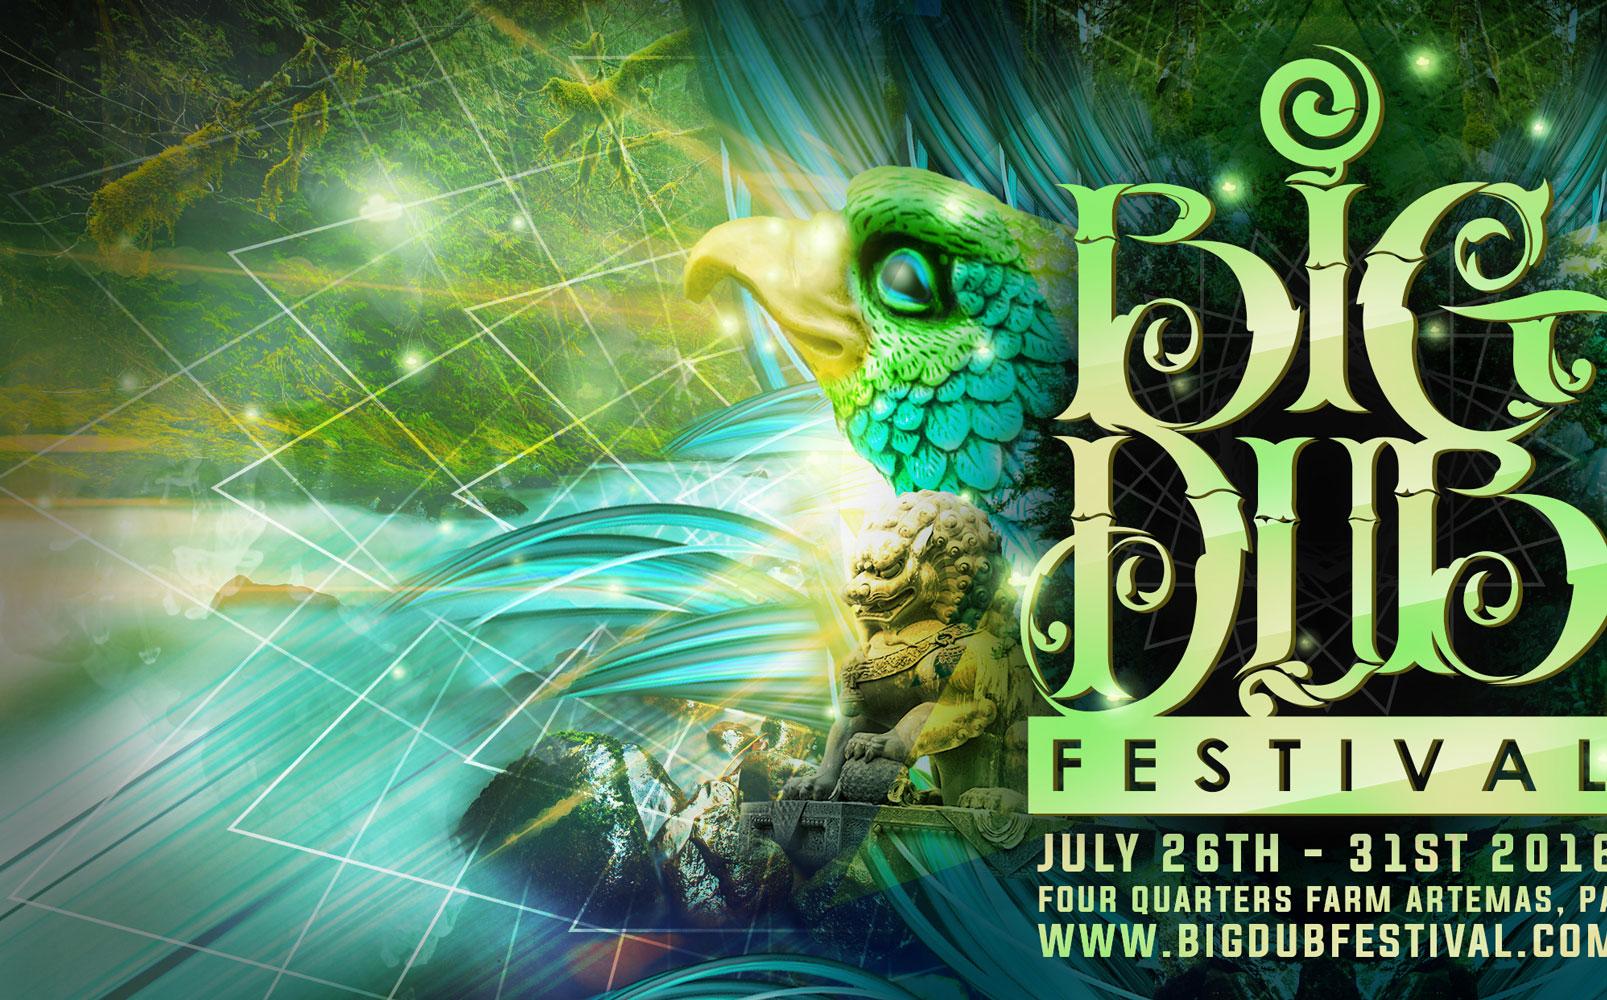 Big Dub Festival flyer design by Jay Clue (cropped)